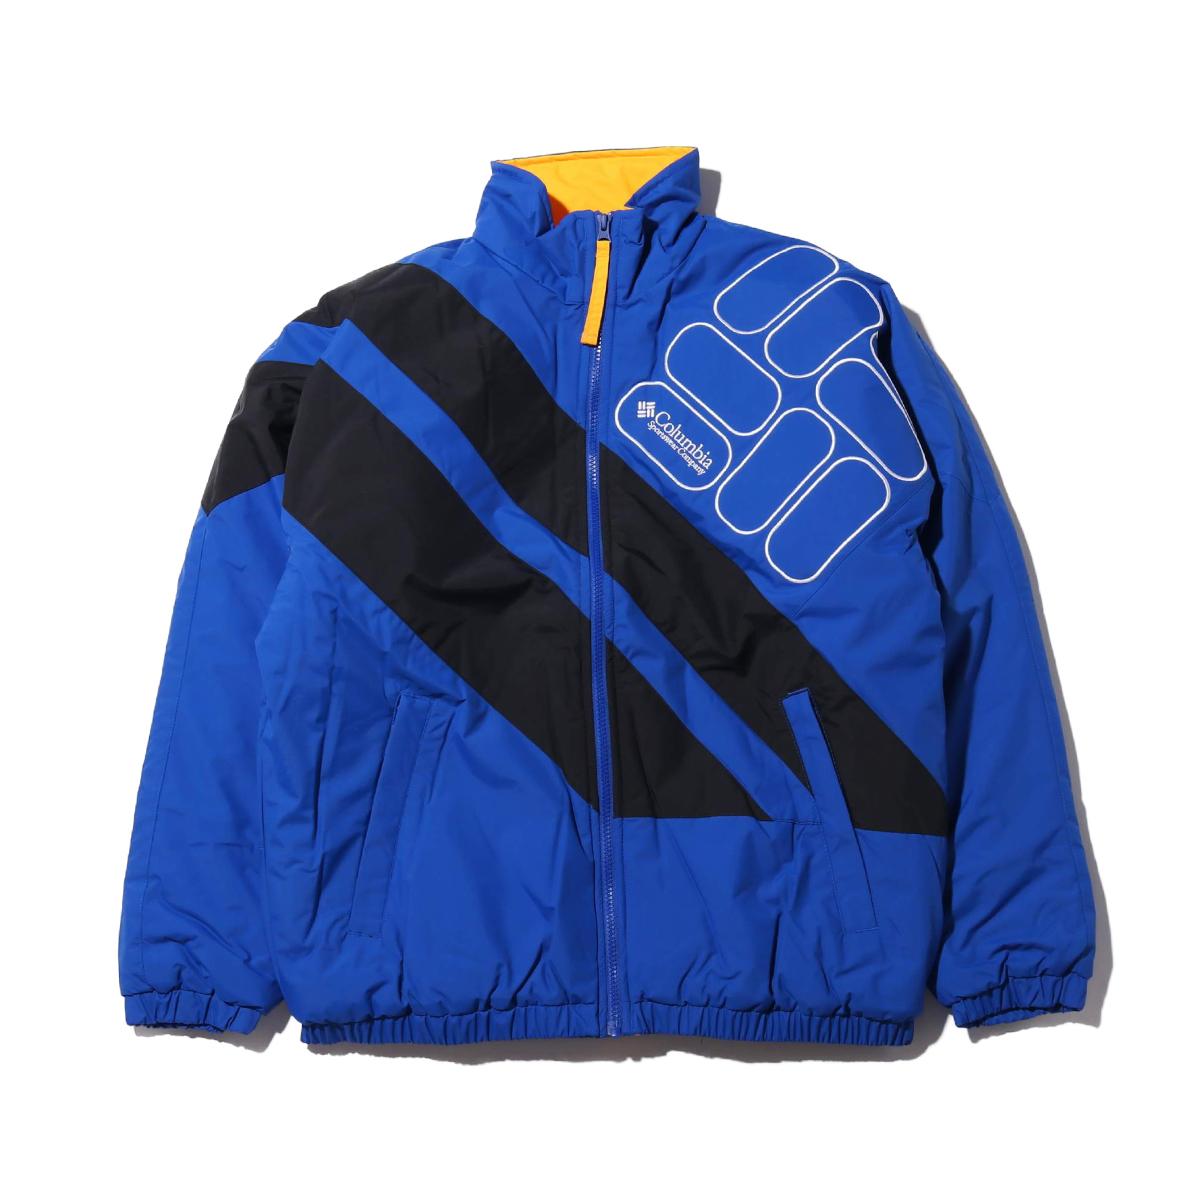 Columbia Sideline™ Parka(コロンビア サイドライン パーカー)Azul, Black【メンズ パーカー】19FA-I